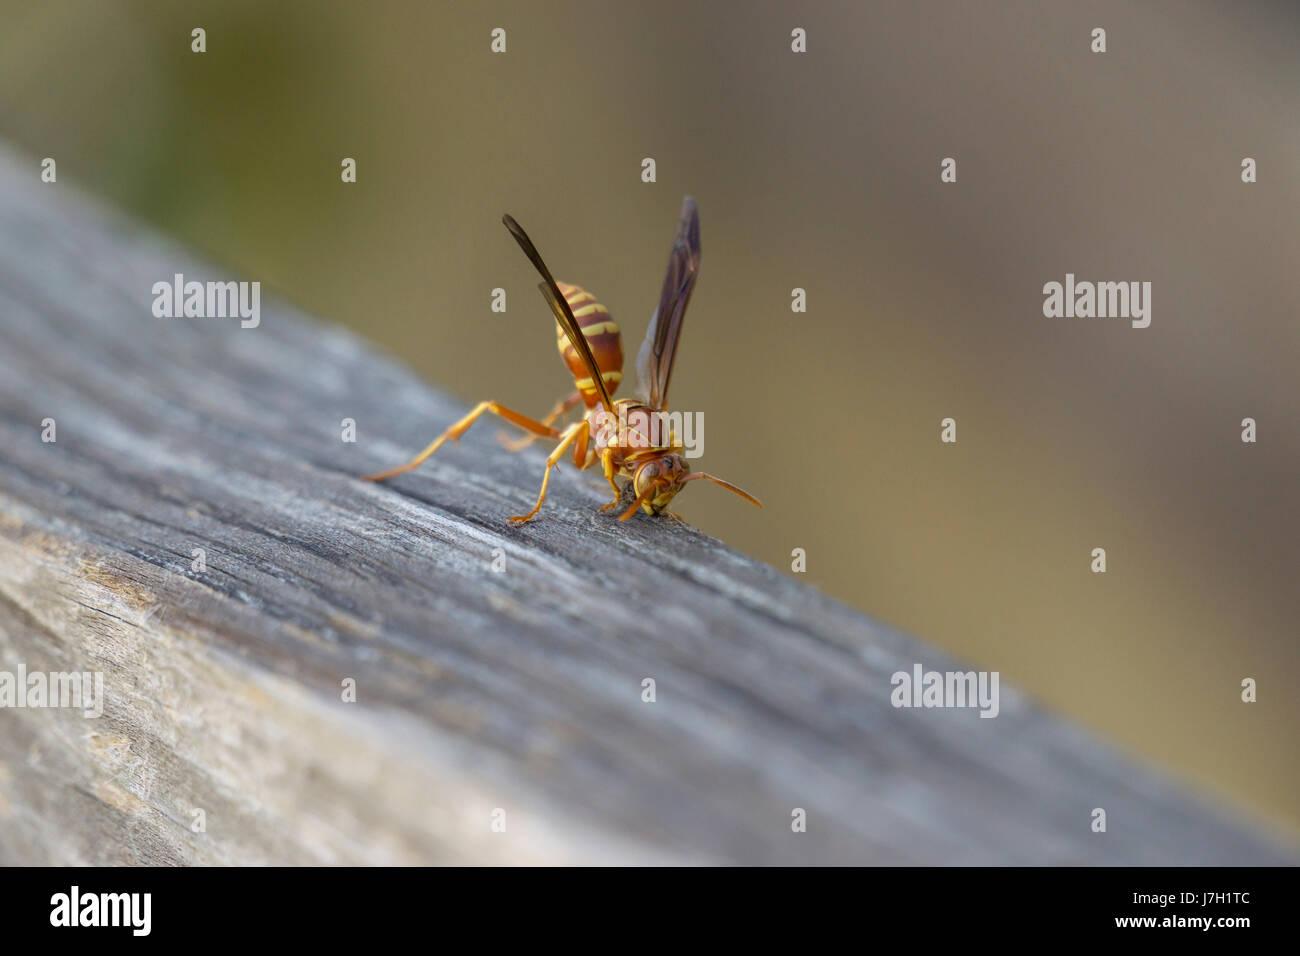 Wasp on wood Stock Photo